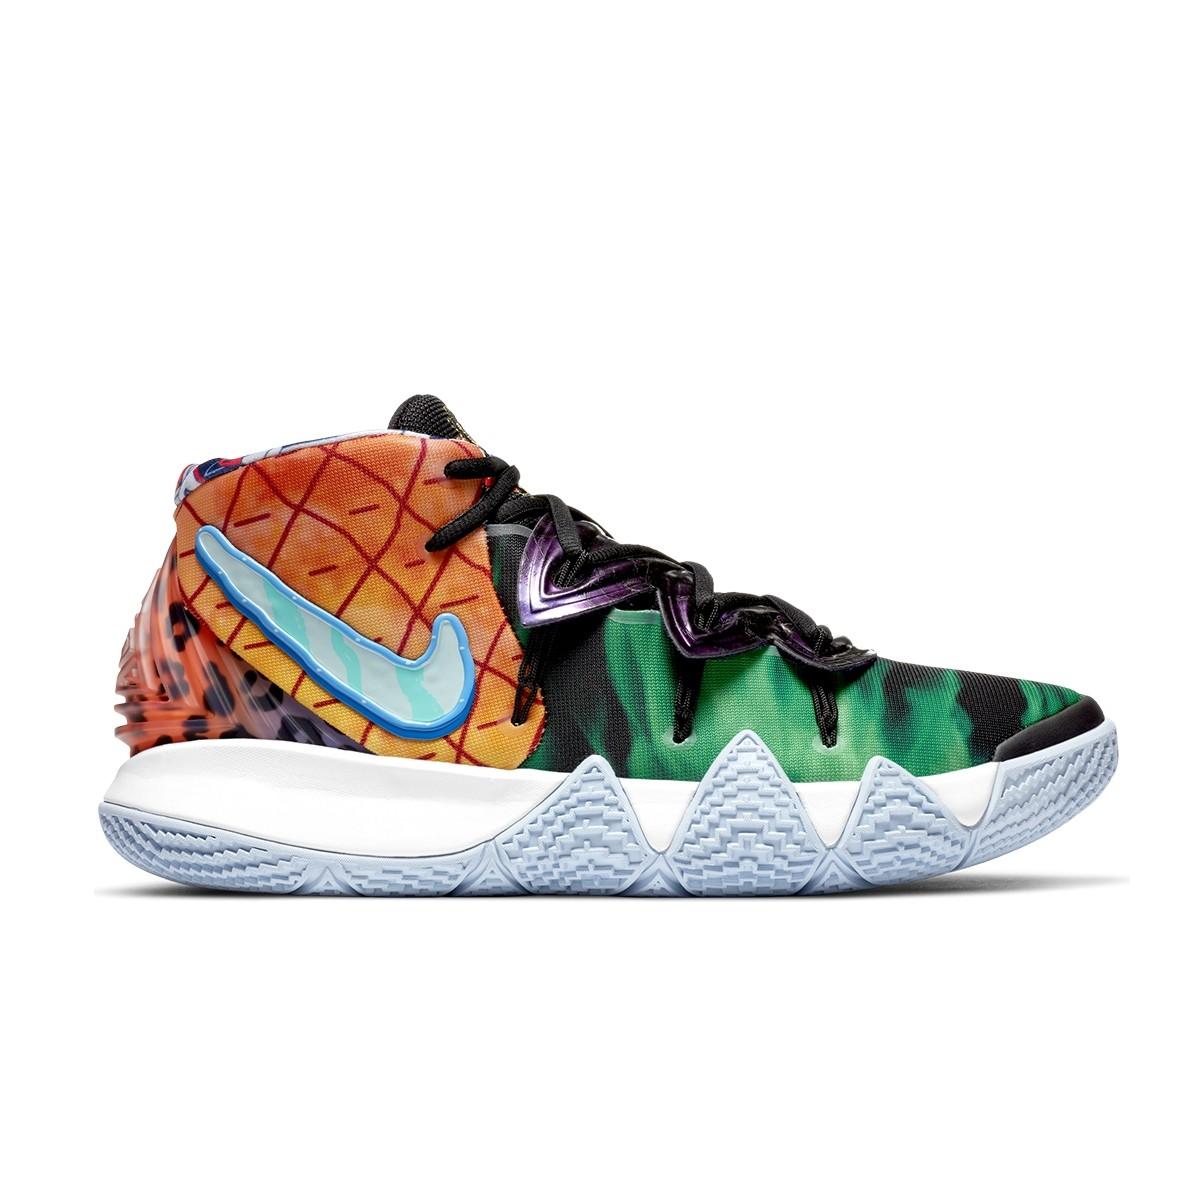 Nike Kyrie S2 Hybrid 'Pineapple'